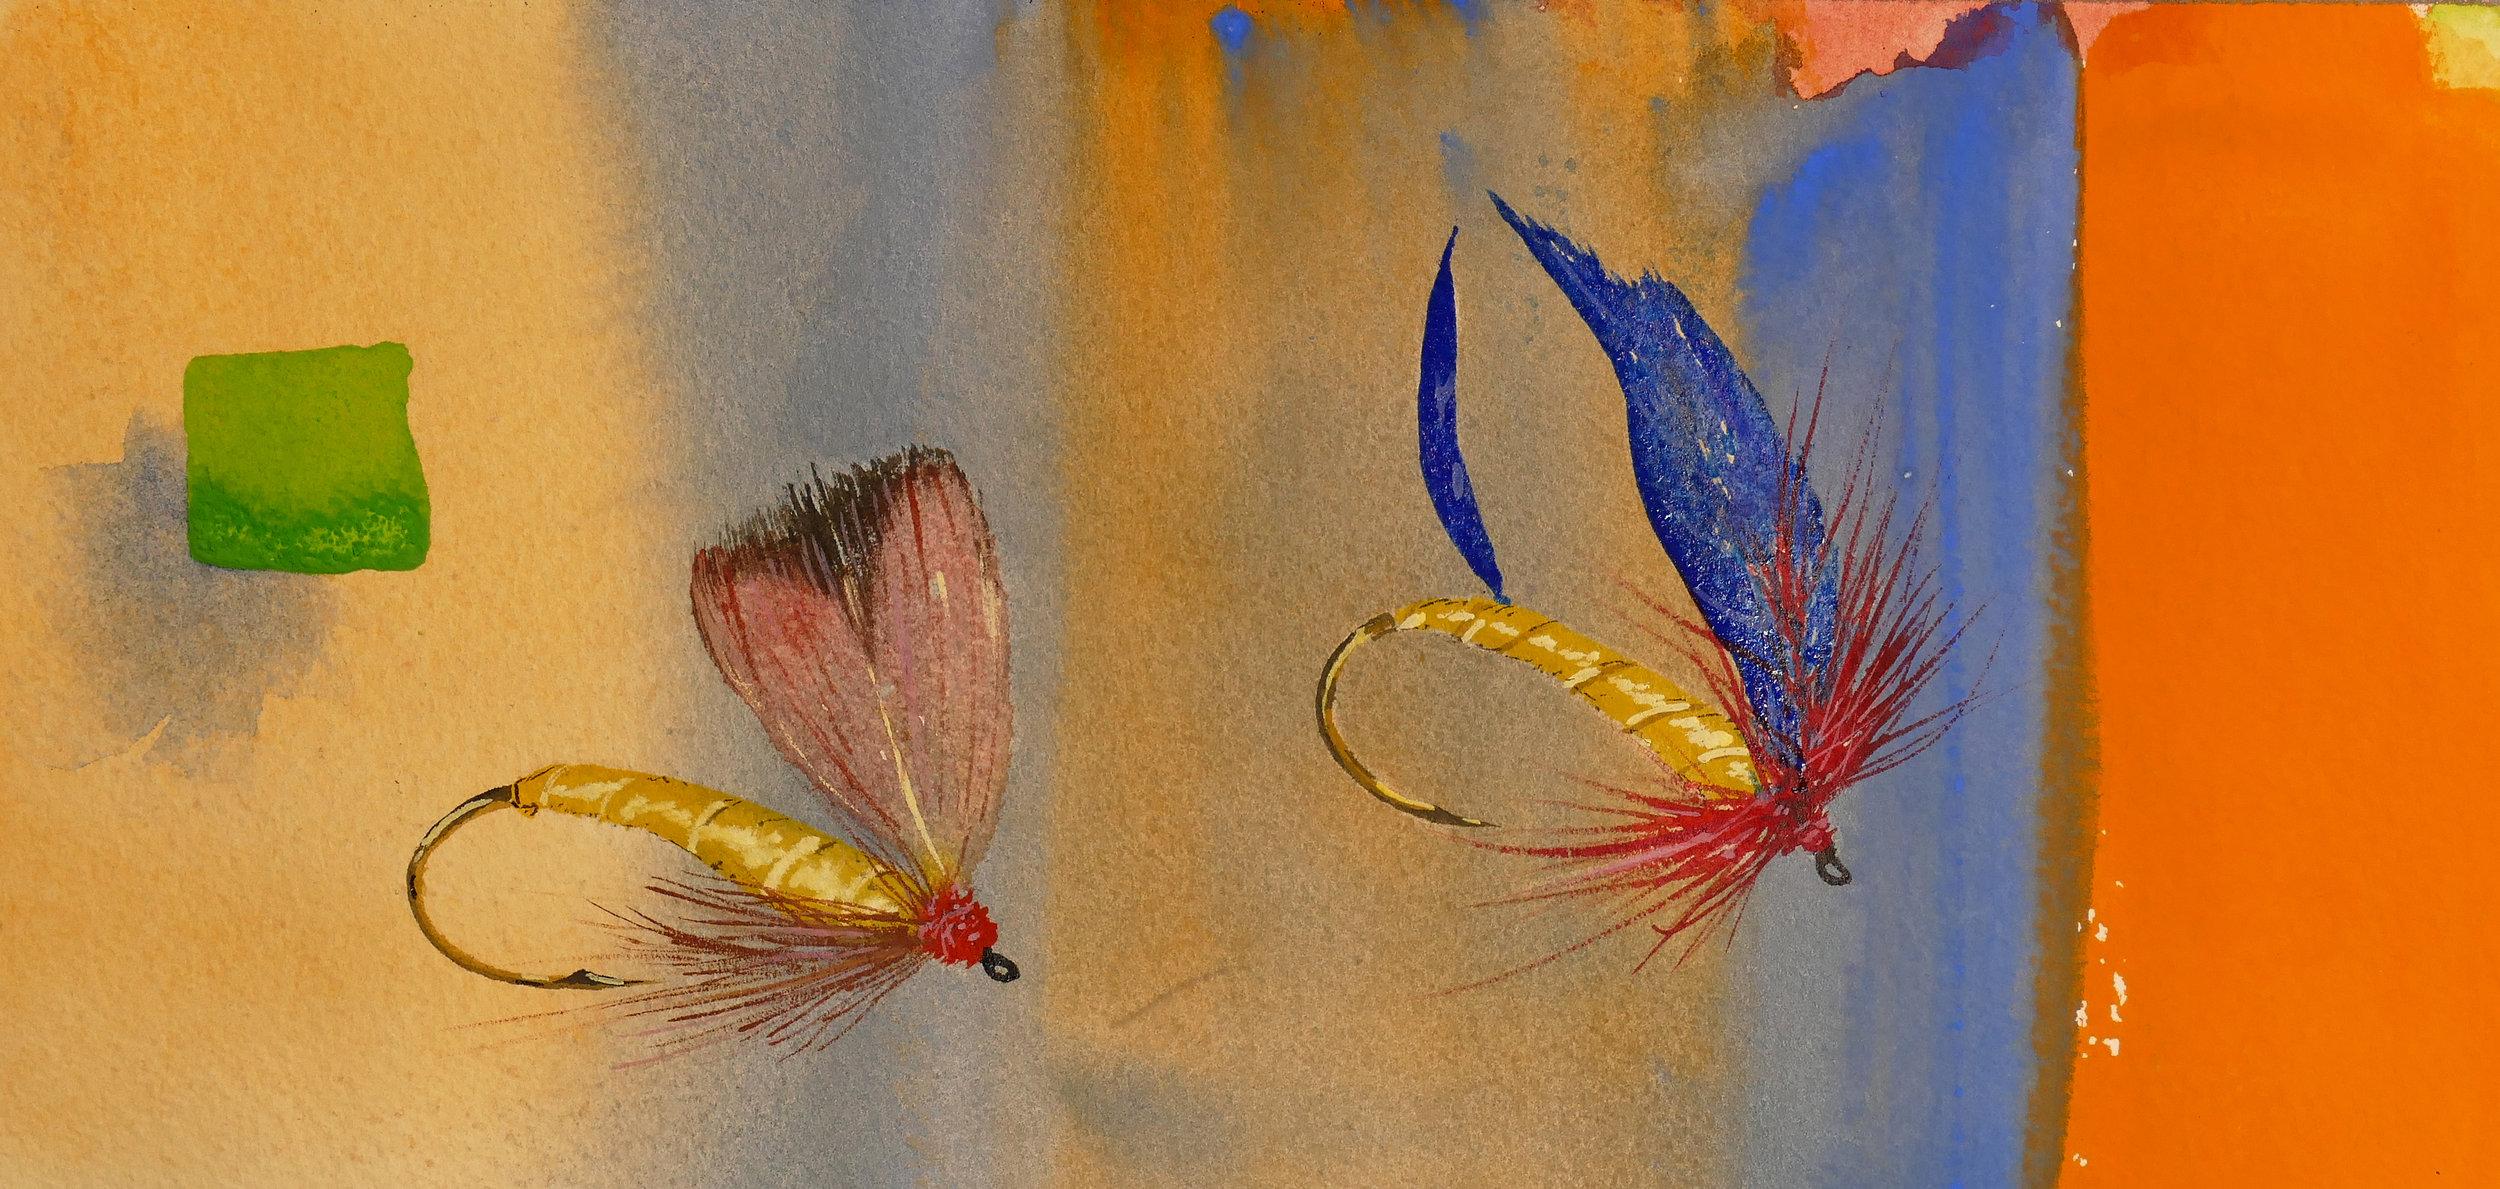 Pheasant & Jenny Lind